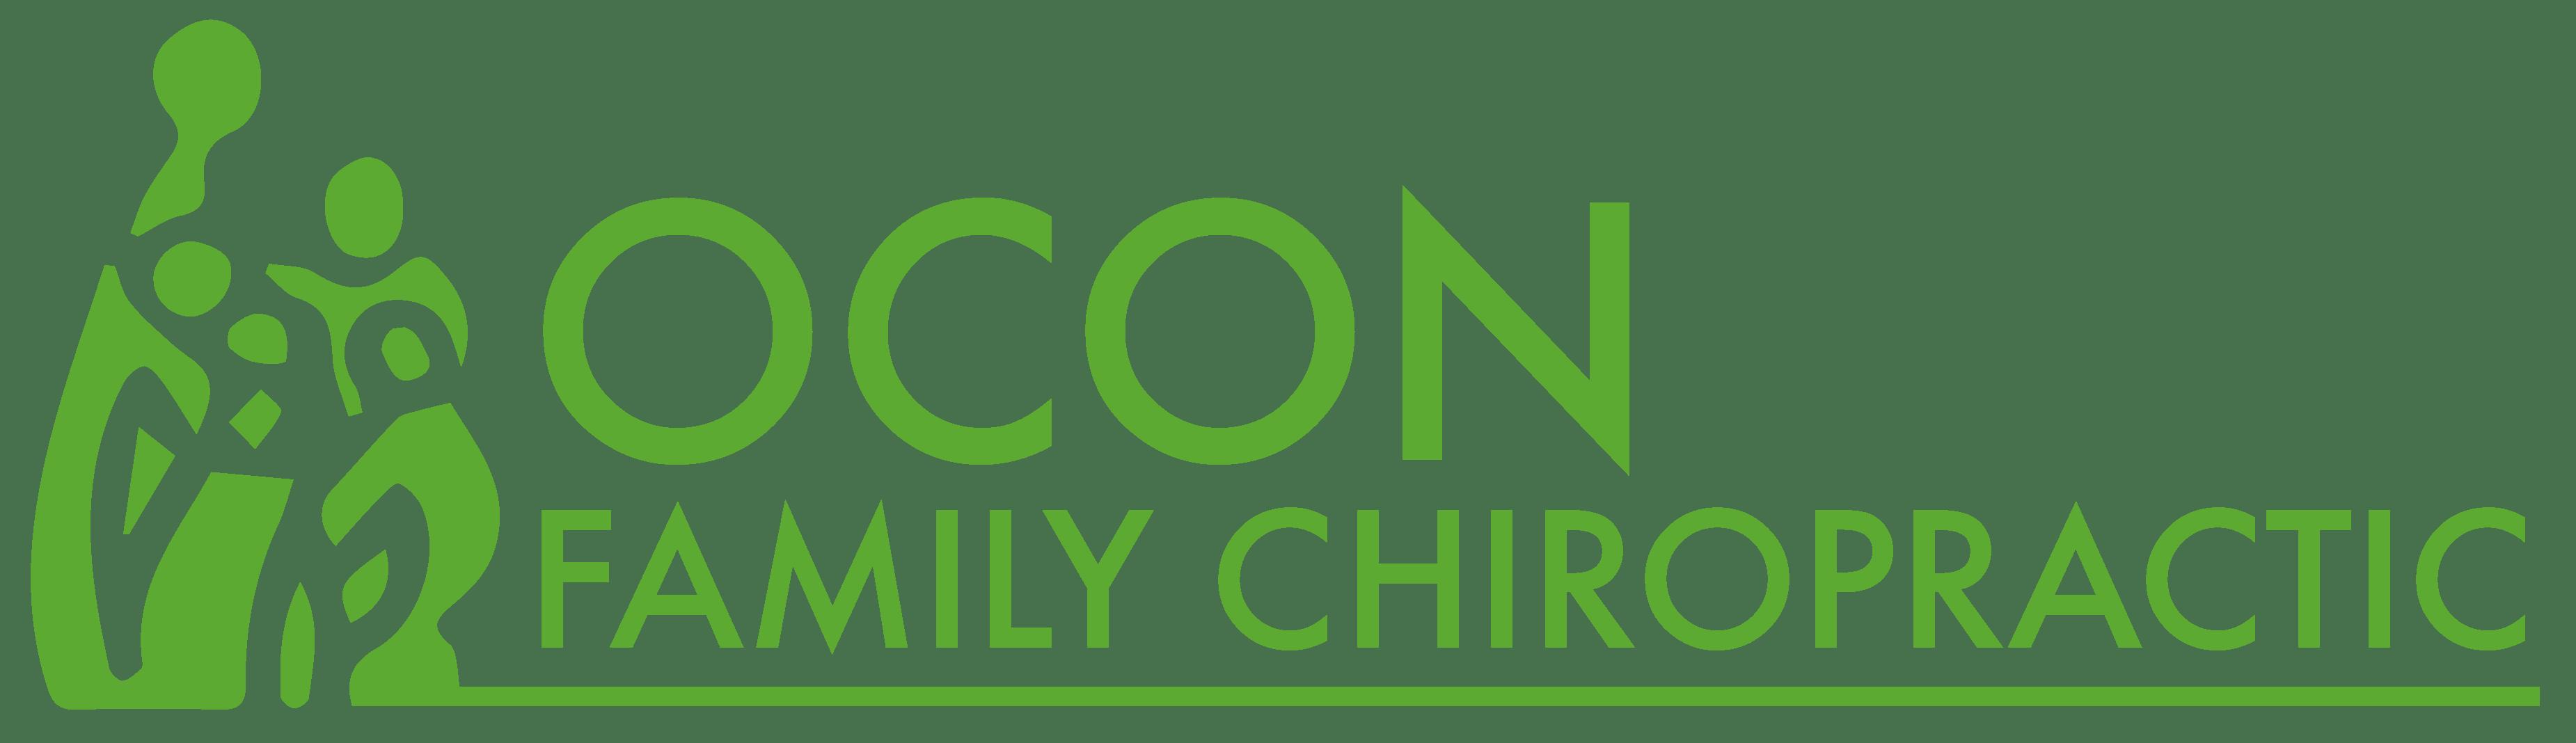 Ocon Family Chiropractic